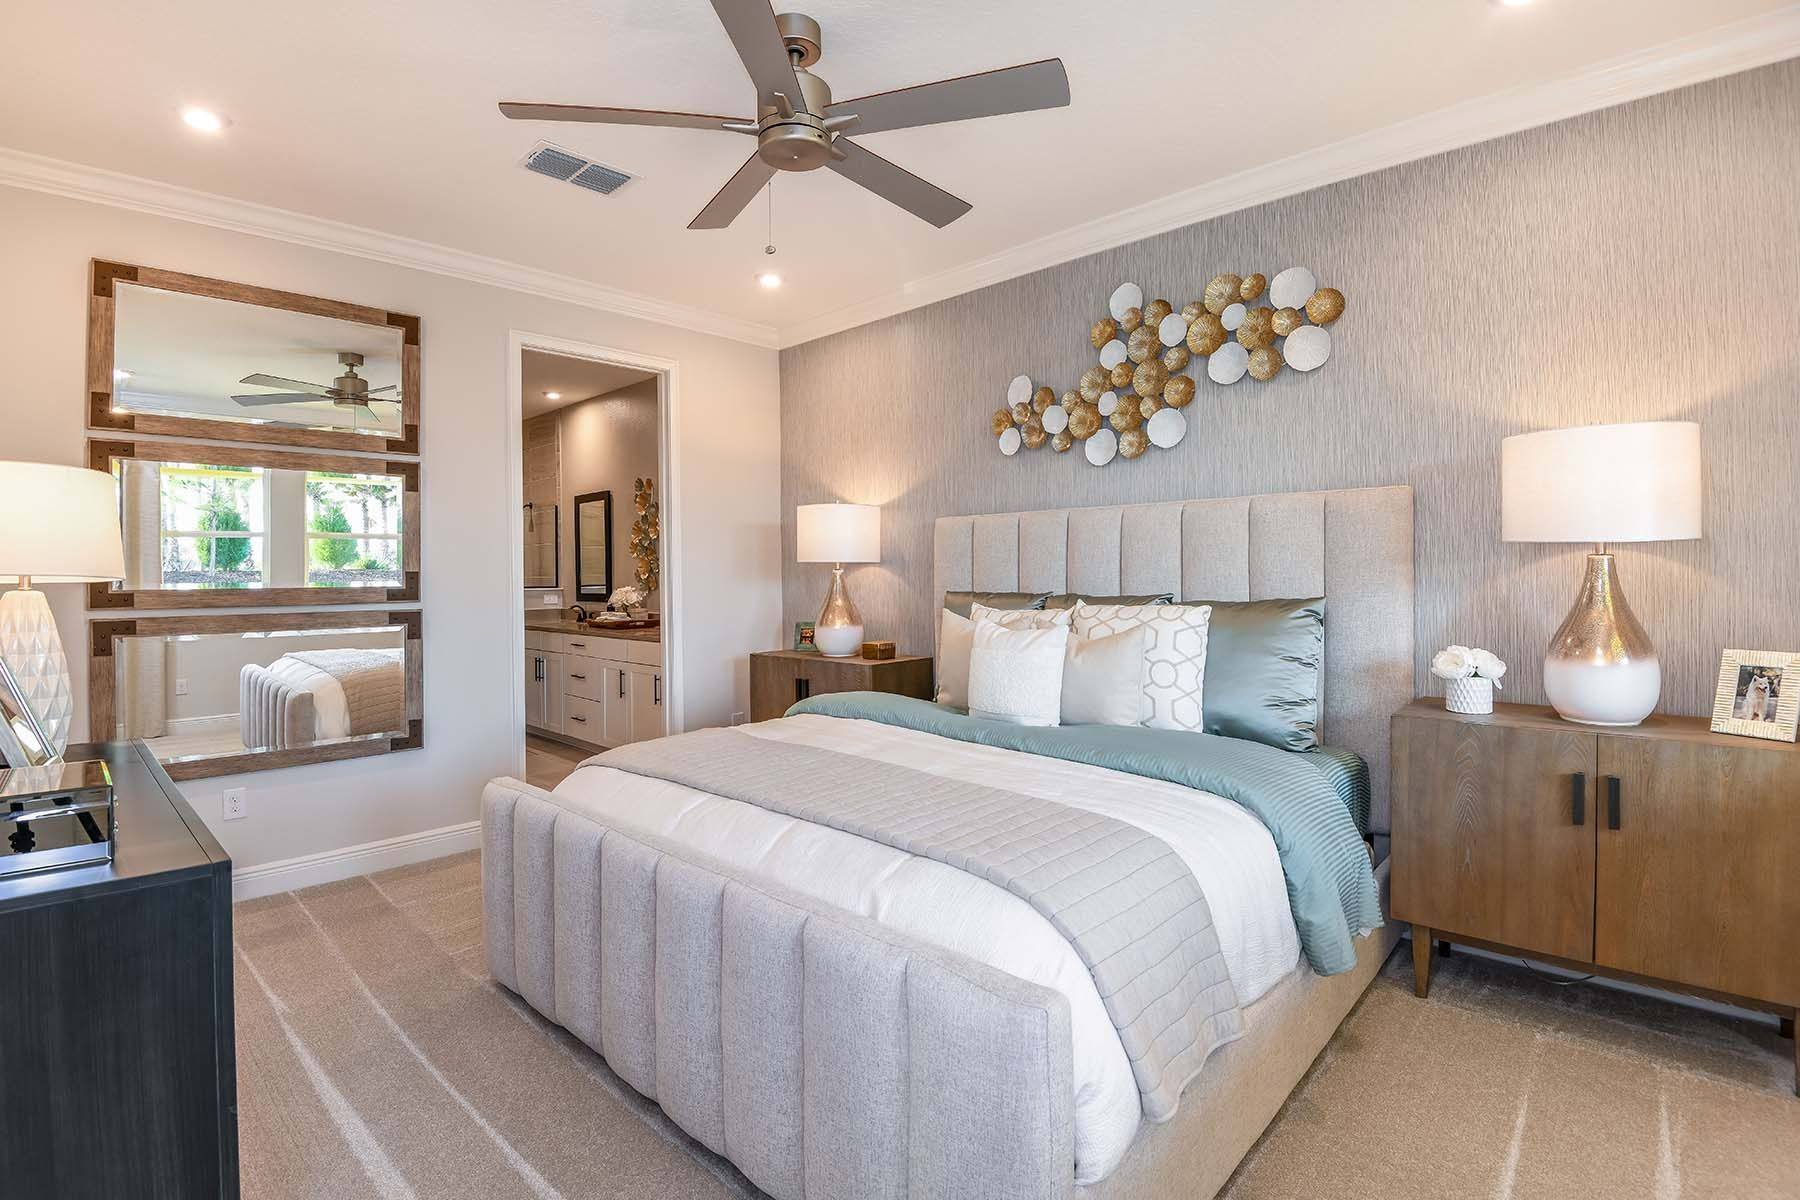 Bedroom featured in the Sandbar By Mattamy Homes in Sarasota-Bradenton, FL